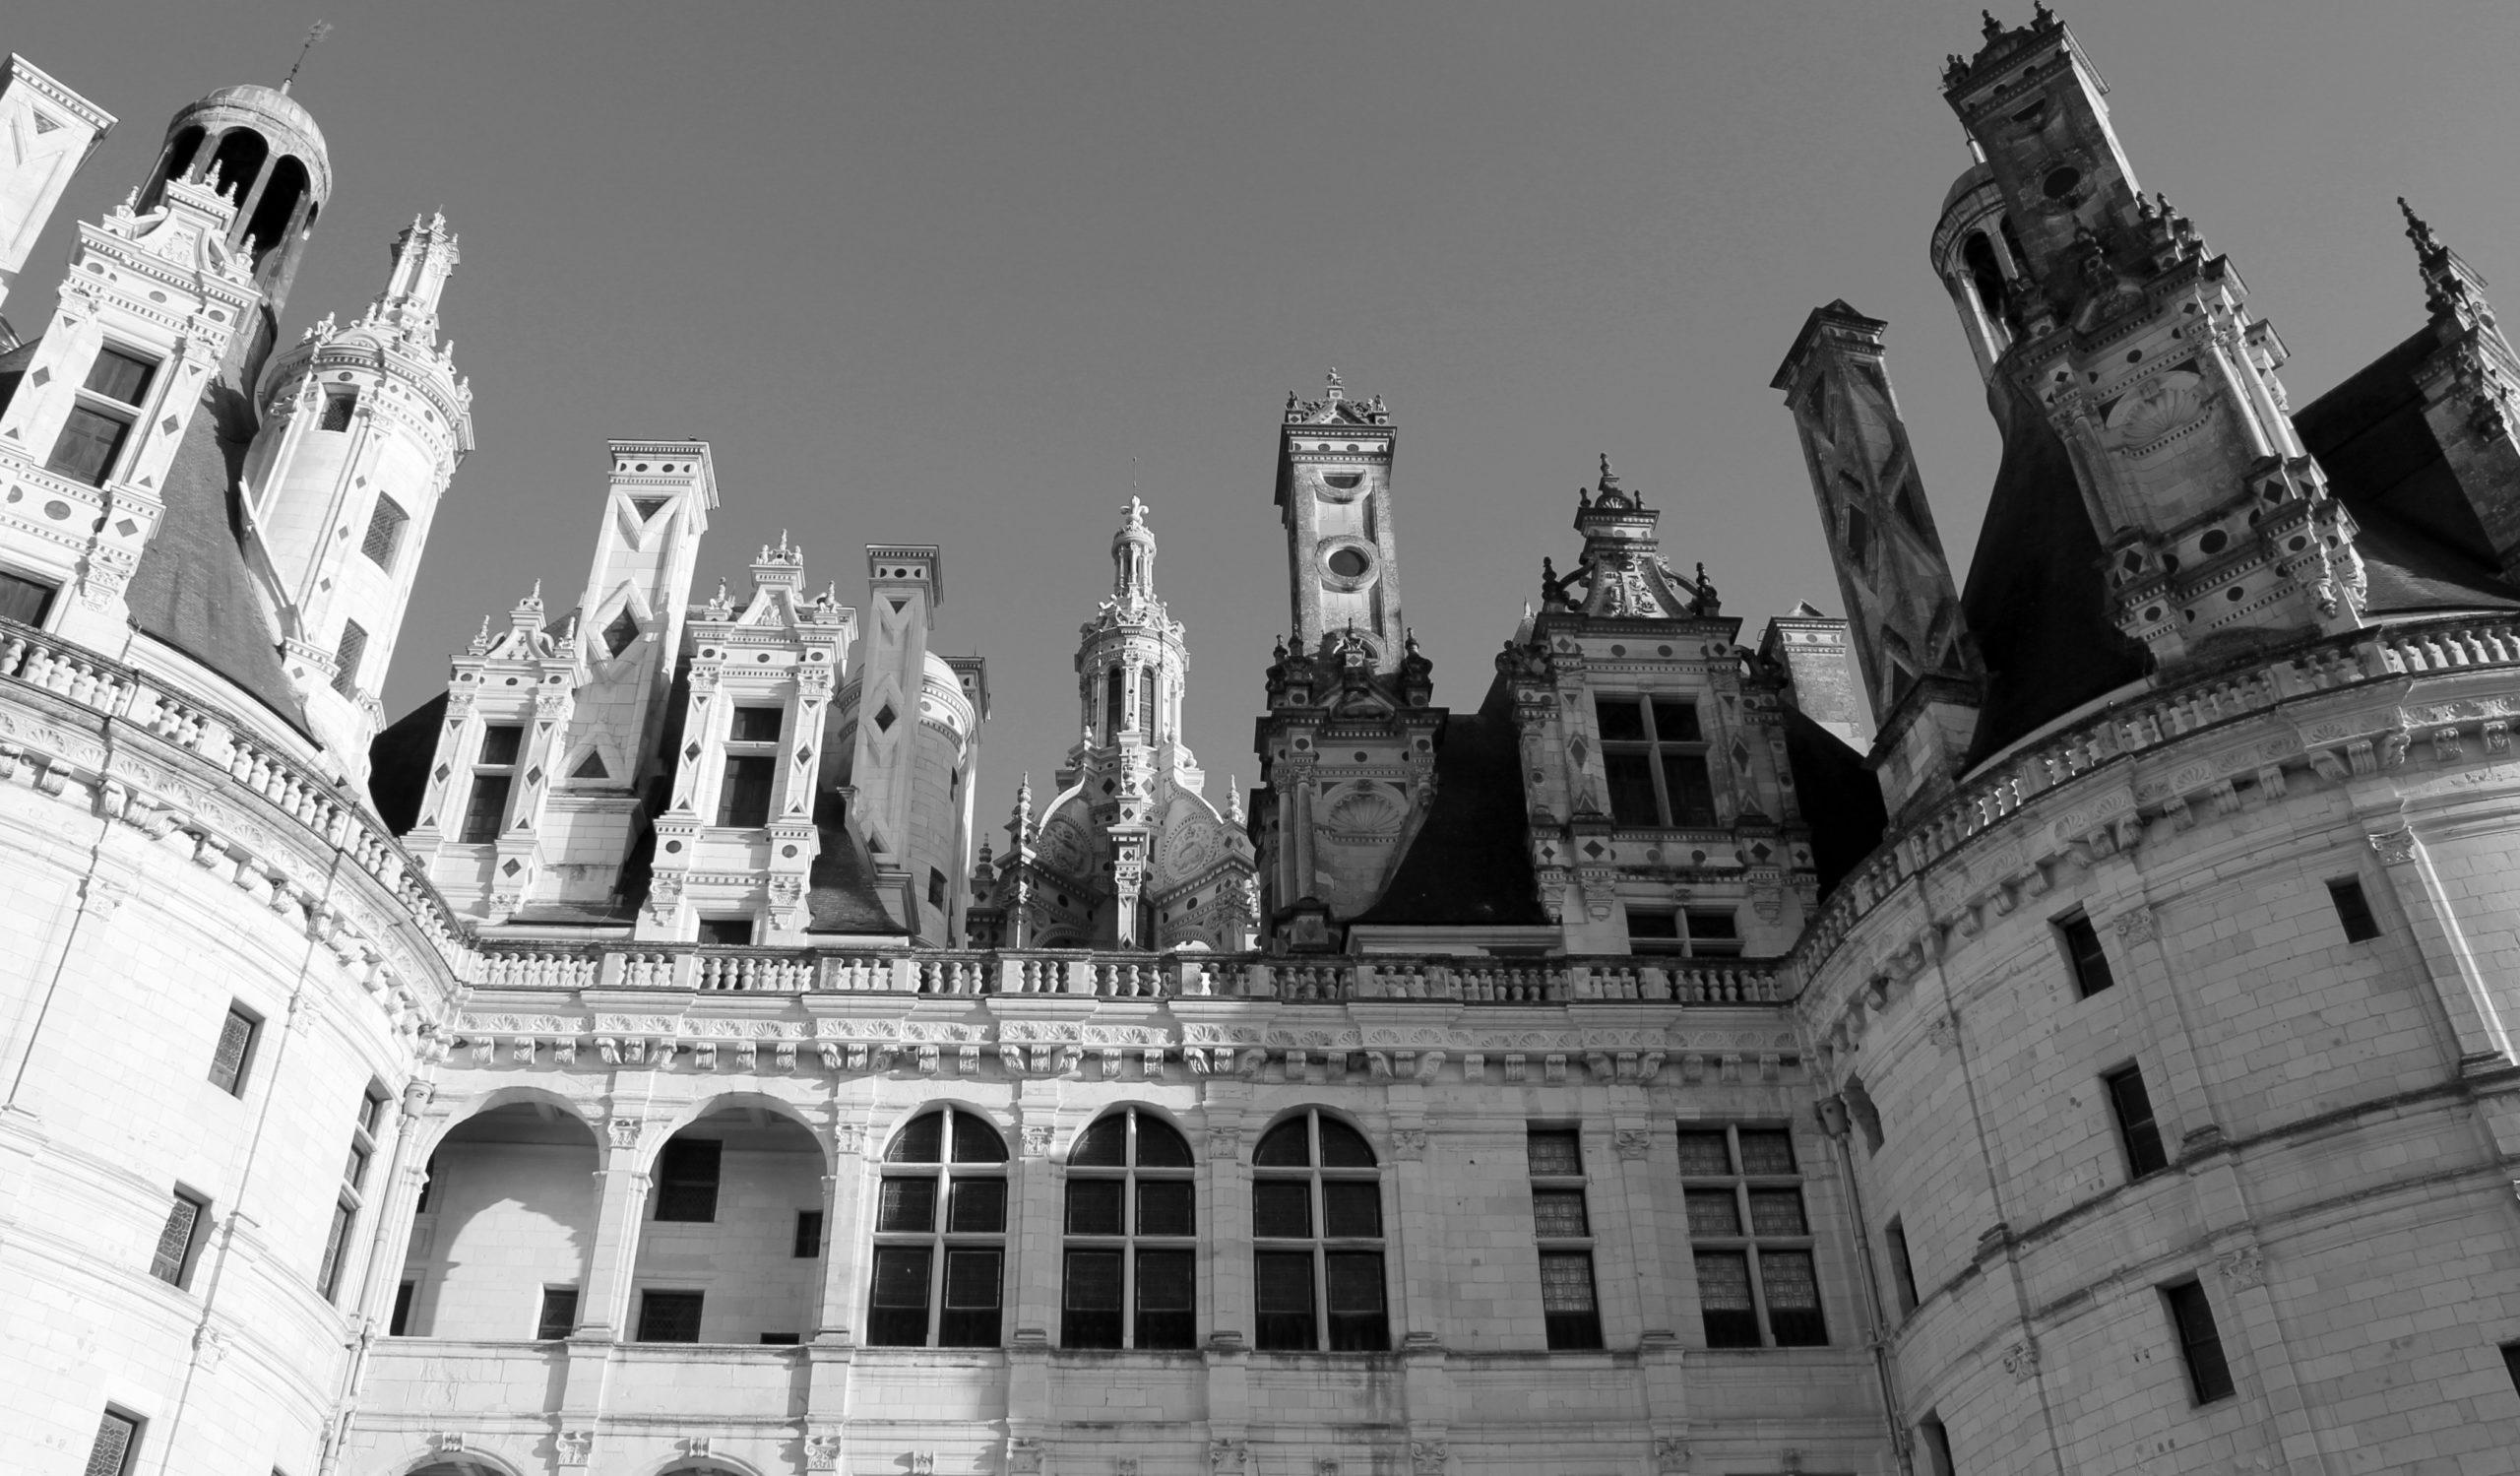 https://ufe-experts.fr/wp-content/uploads/2019/08/6-Vue-du-château-de-Chambord-1-scaled.jpg